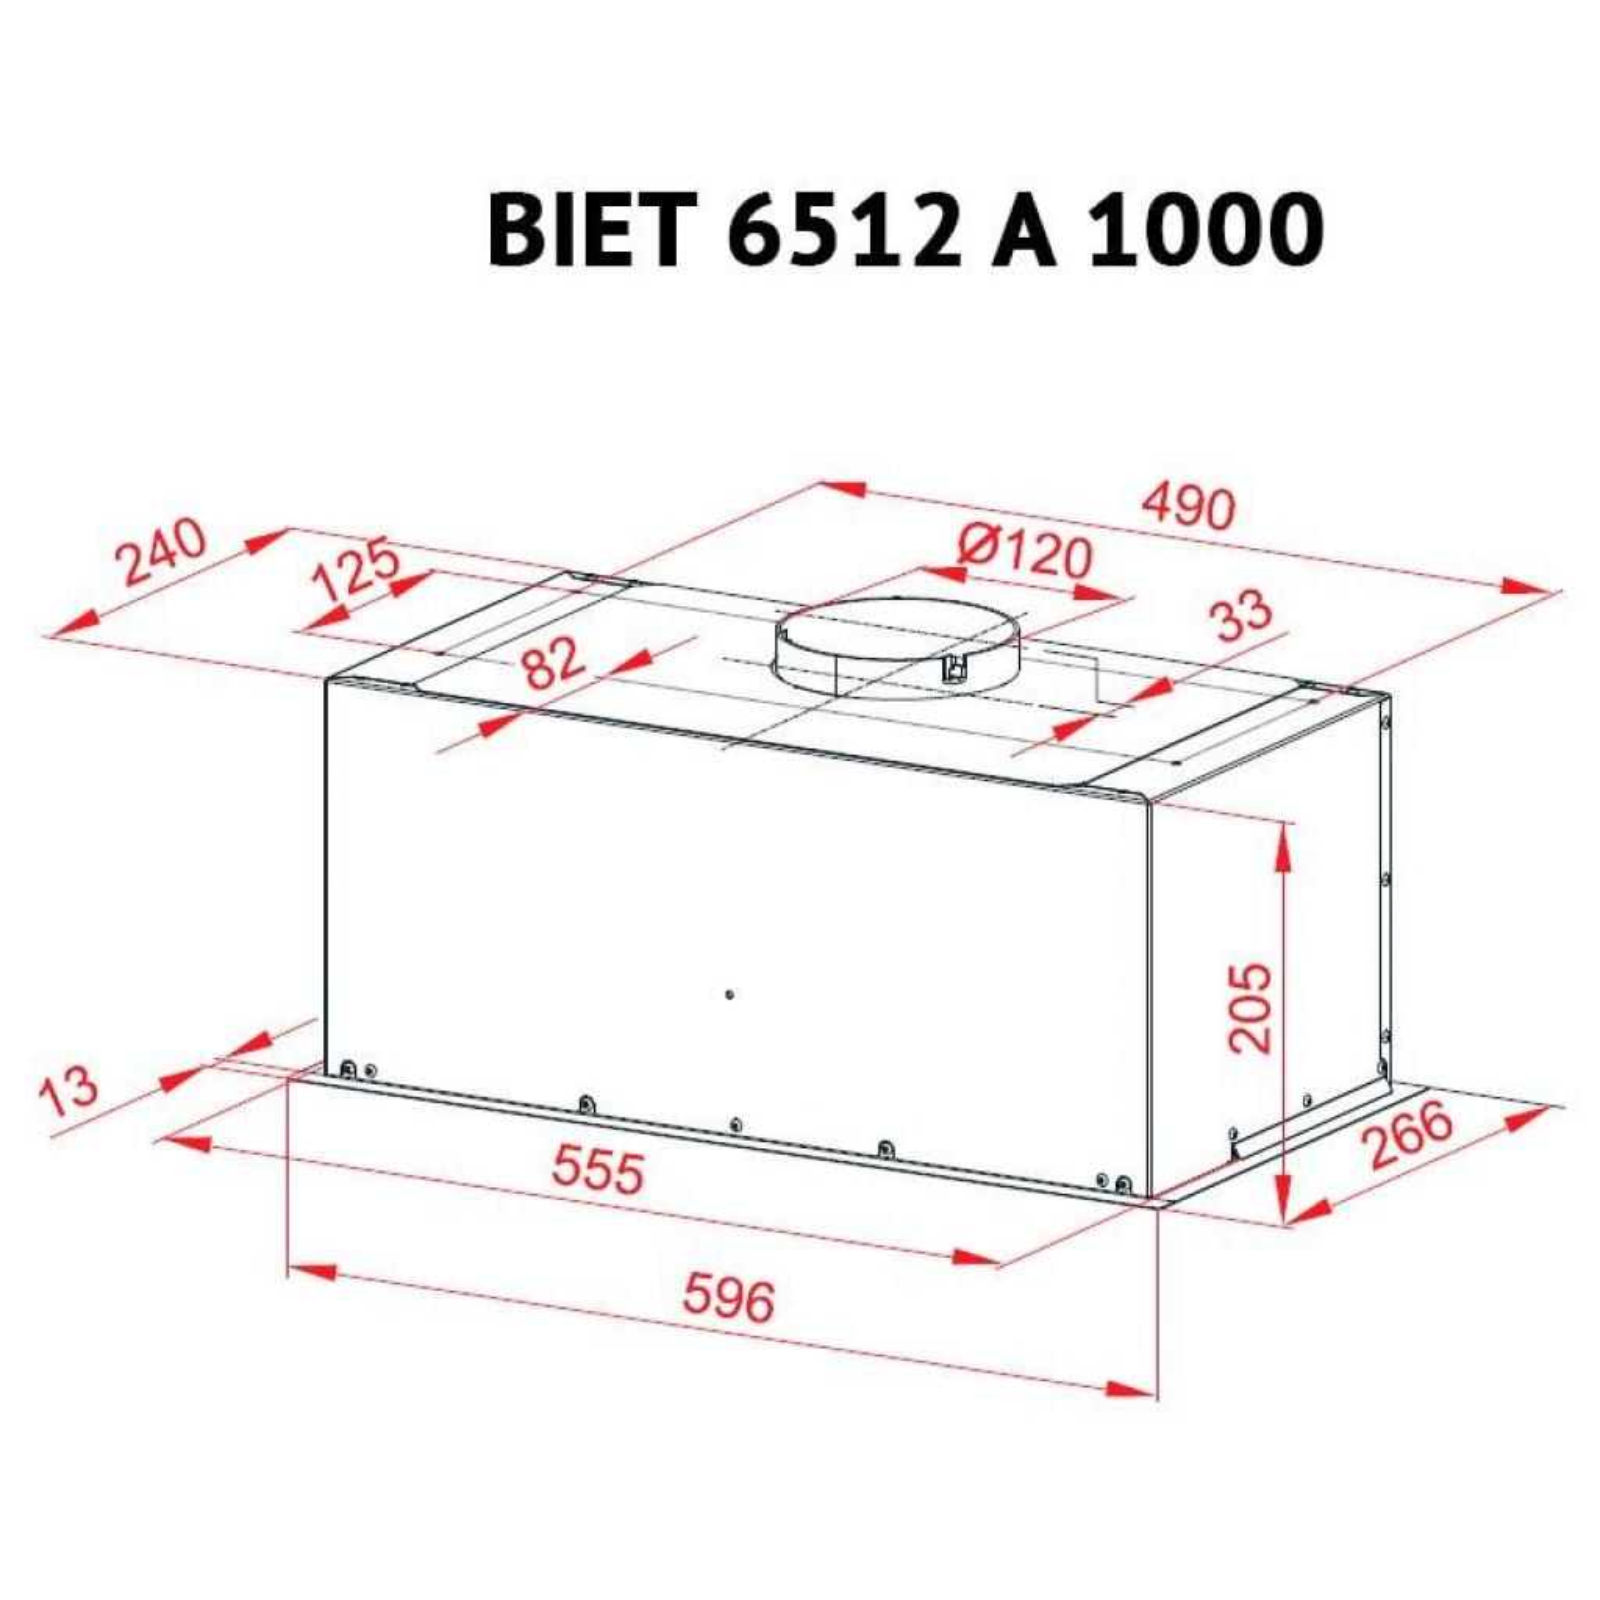 Вытяжка кухонная PERFELLI BIET 6512 A 1000 BL LED изображение 6